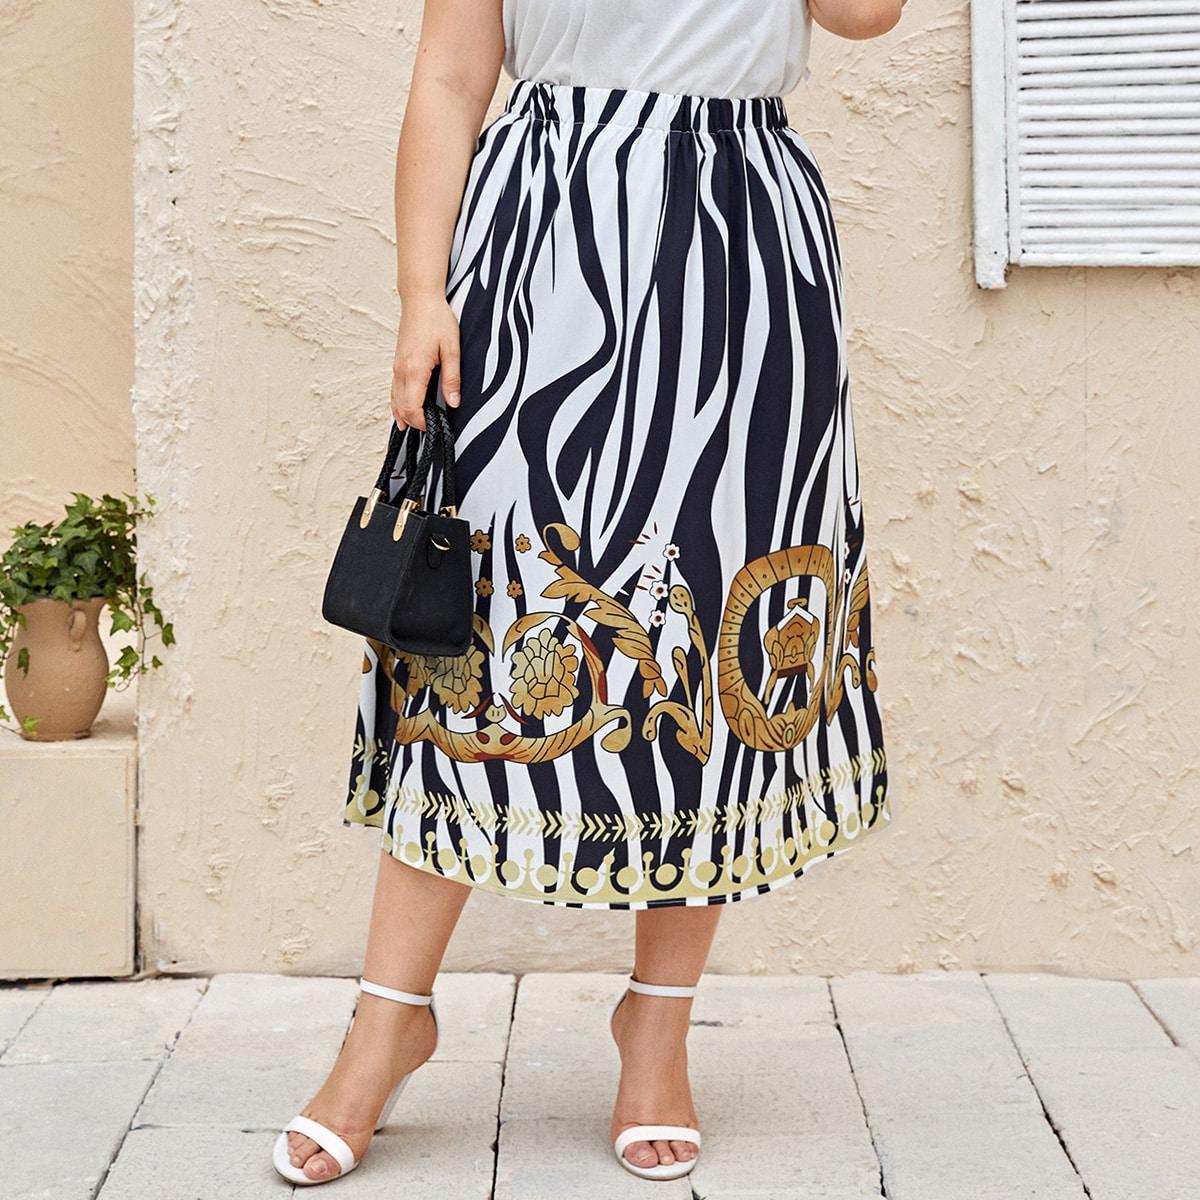 SHEIN / Plus Zebra Stripe And Floral Print High Waist Skirt